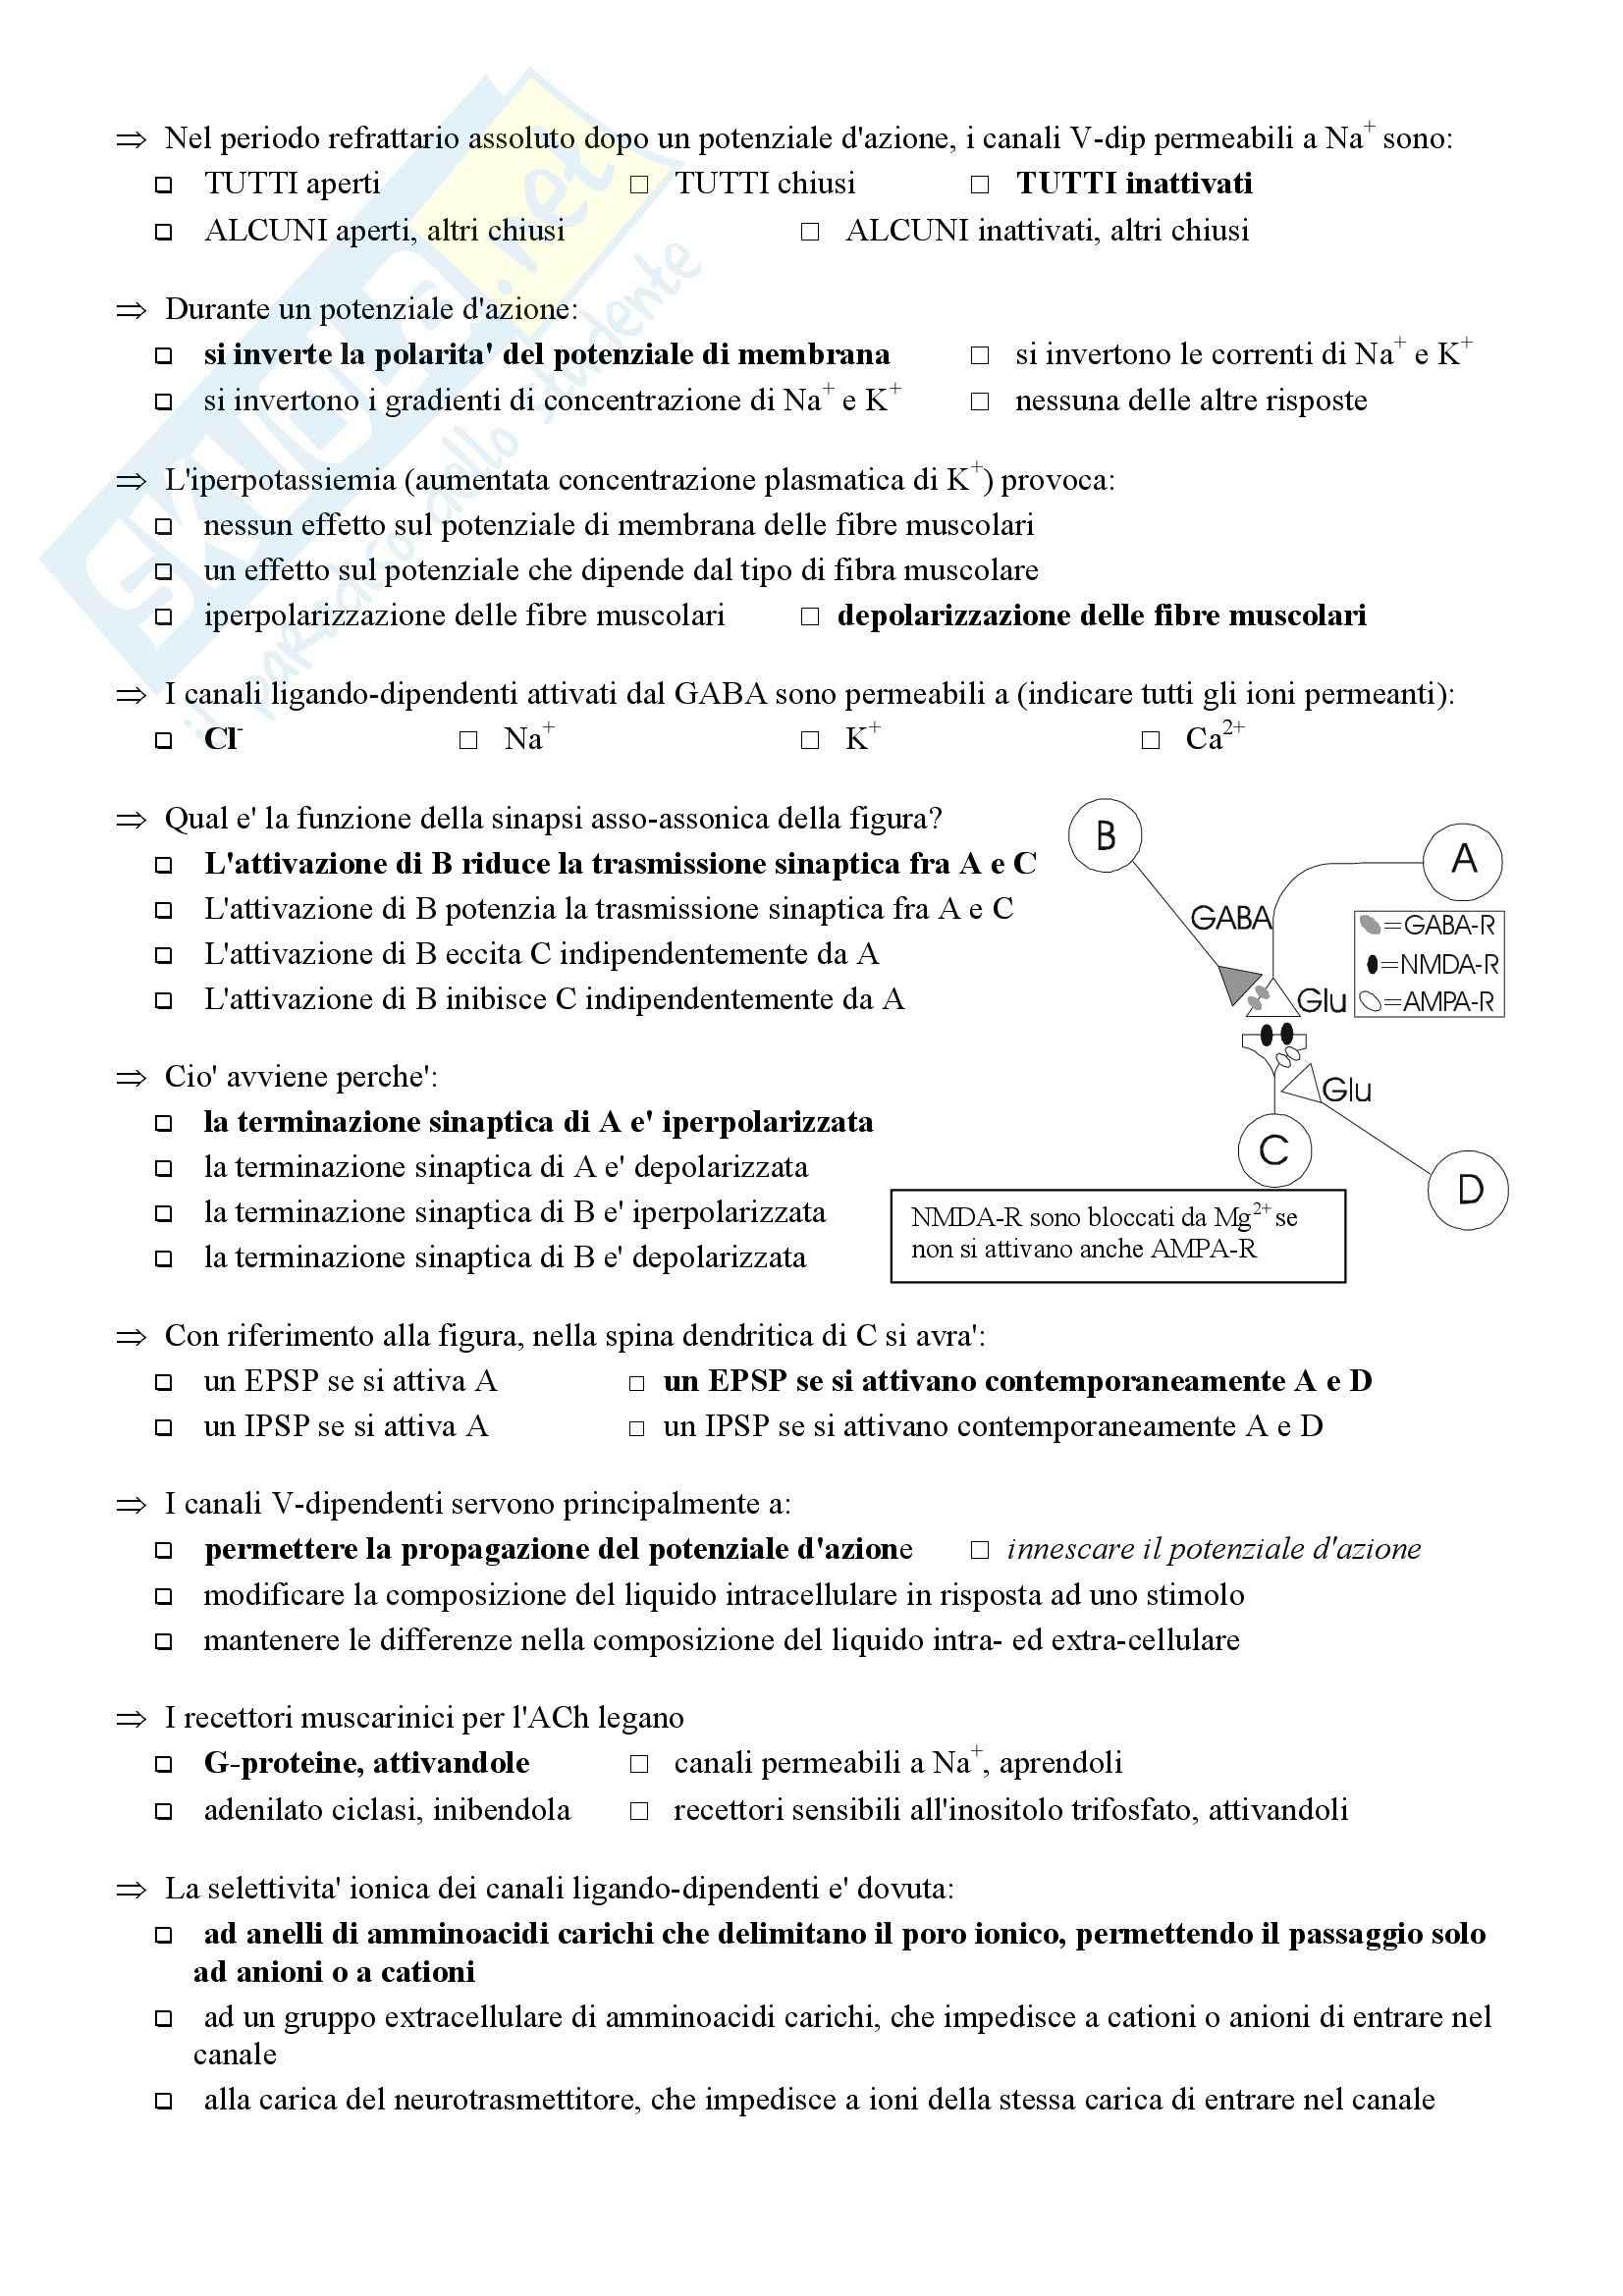 Fisiologia umana I - Test 4 Pag. 2